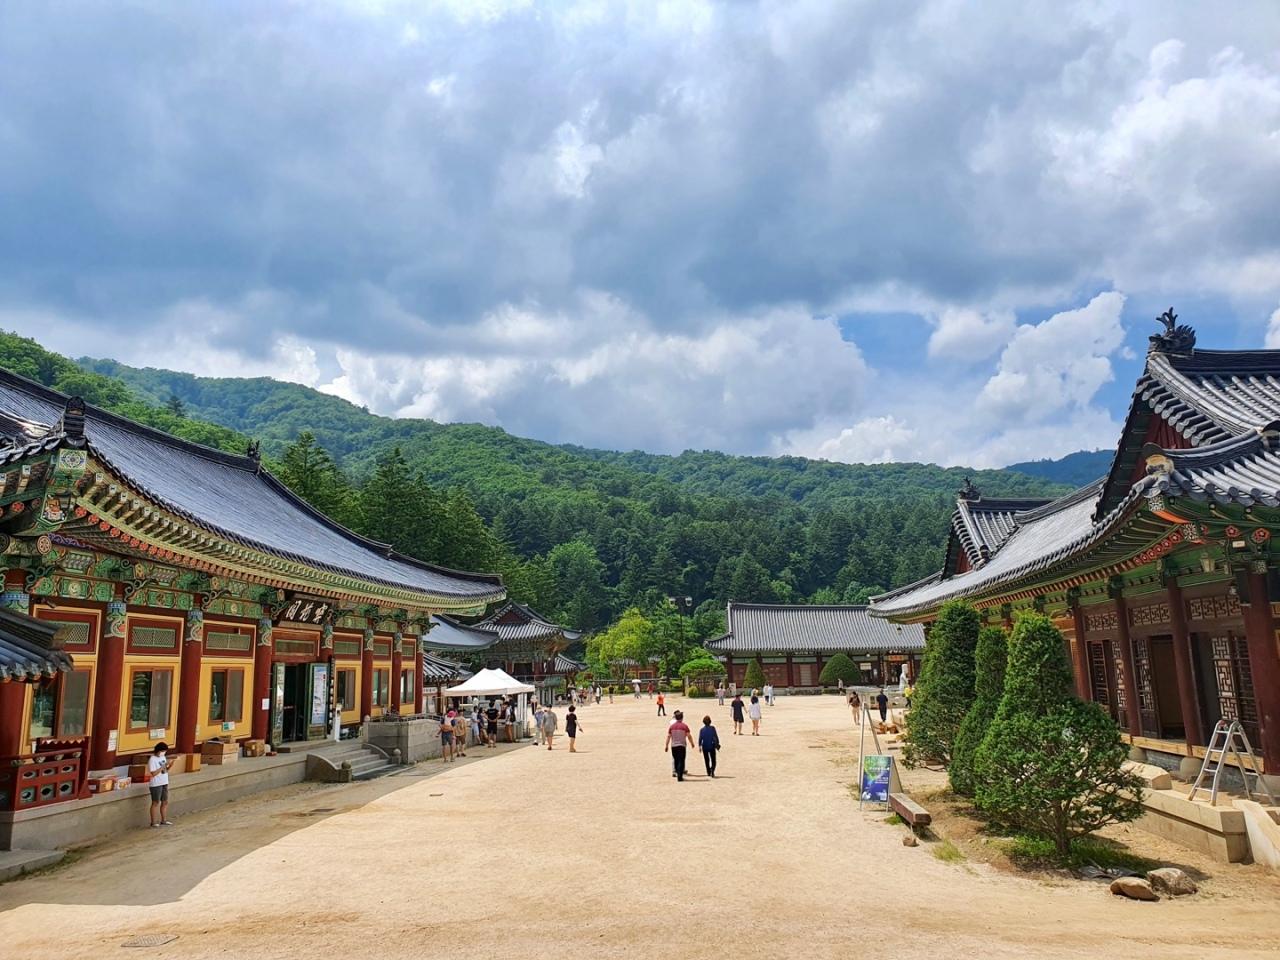 Weoljeongsa at Odaesan in Pyeongchang, Gangwon Province (Im Eun-byel / The Korea Herald)